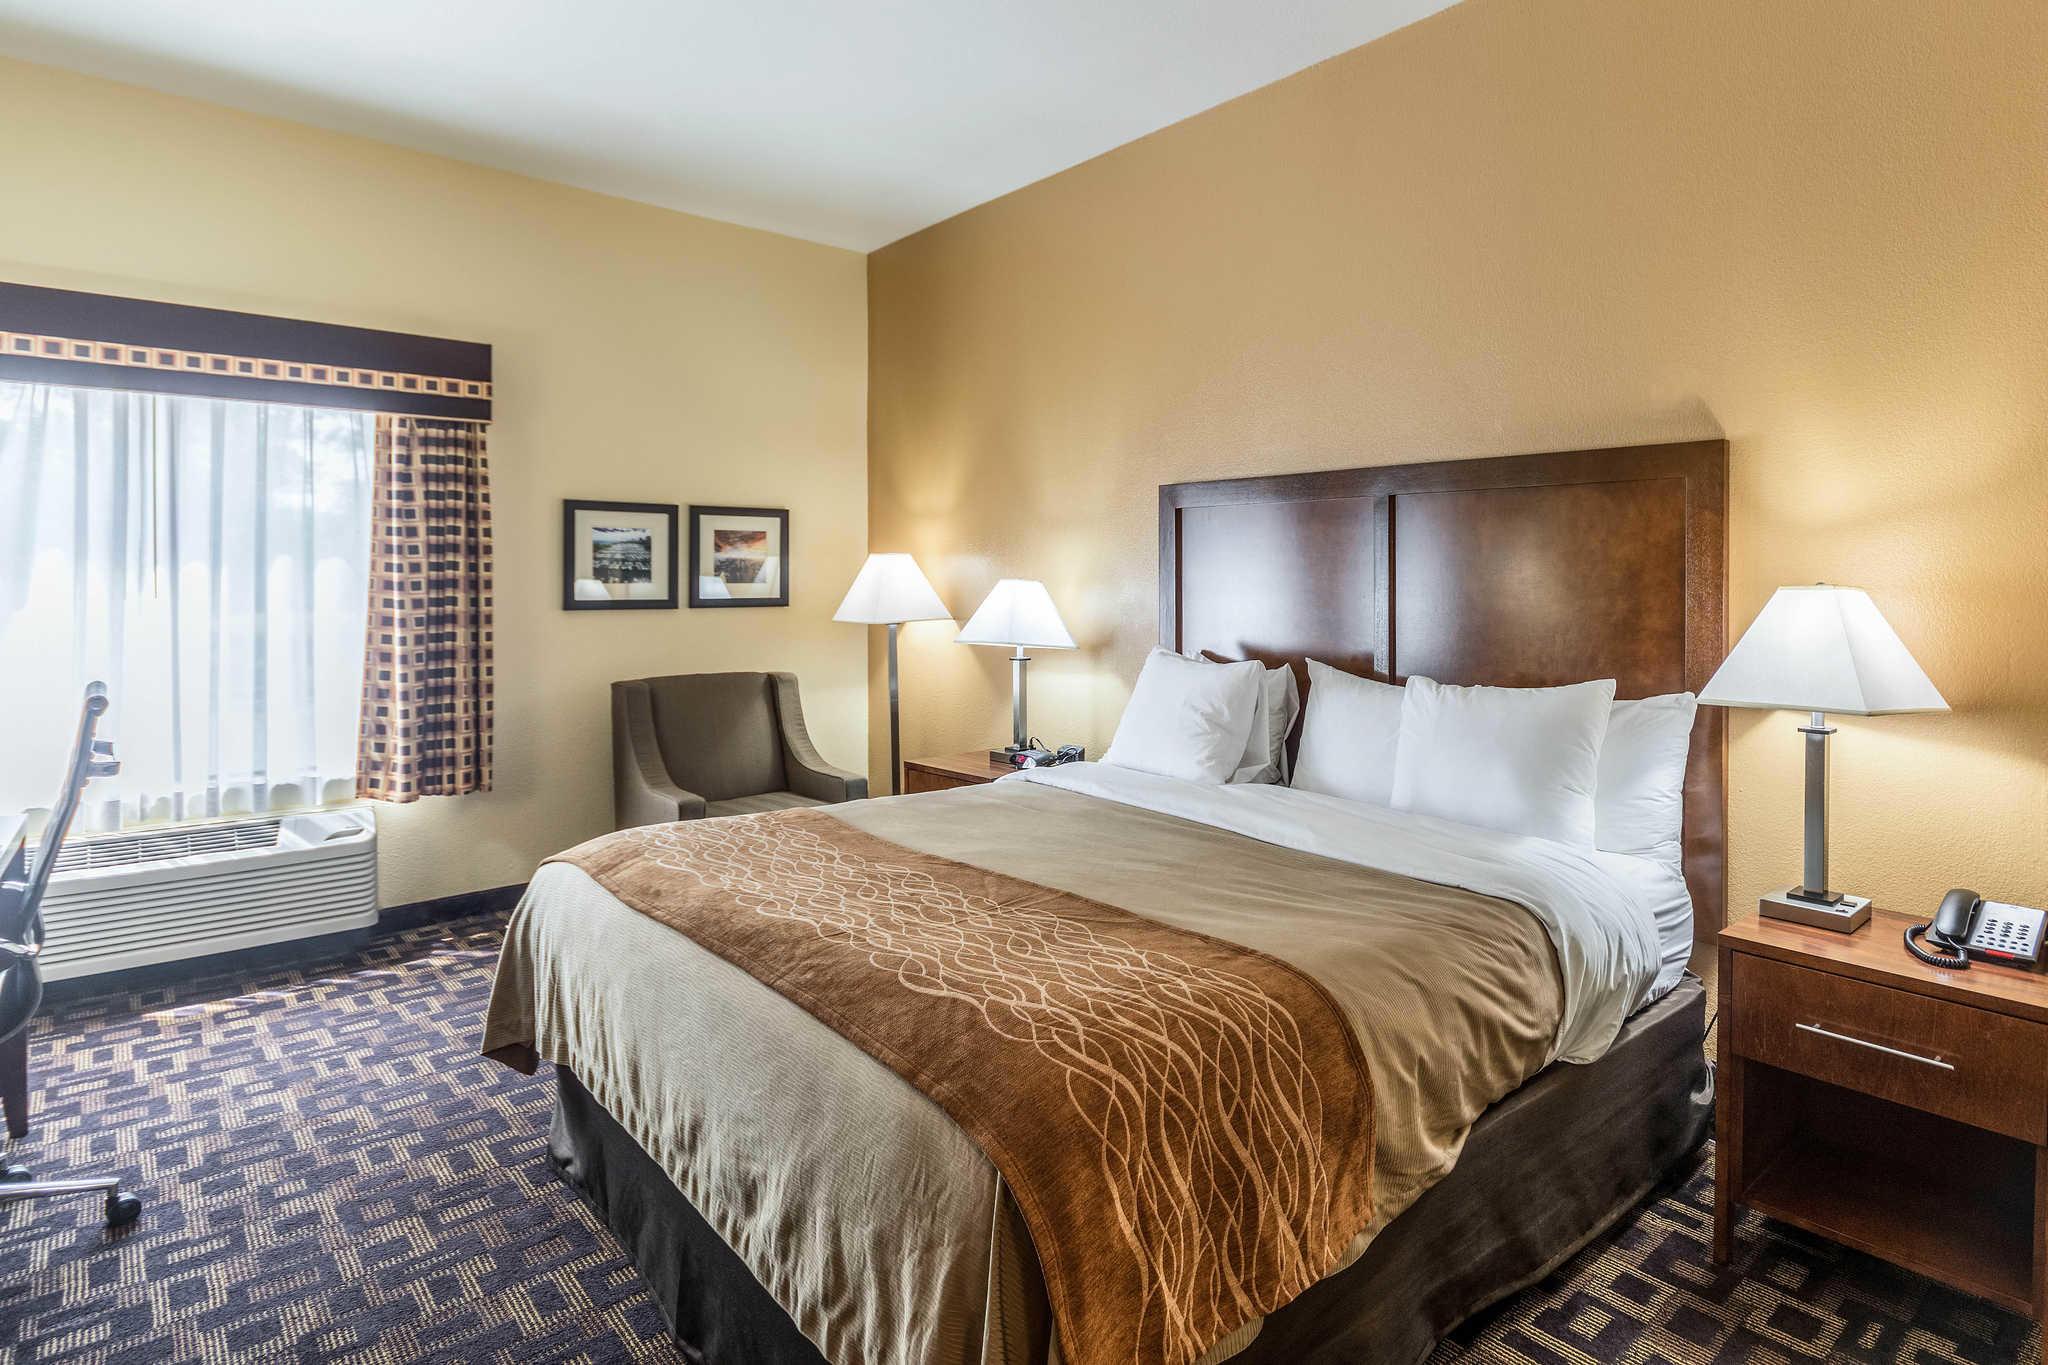 Comfort Inn & Suites North Aurora - Naperville image 9